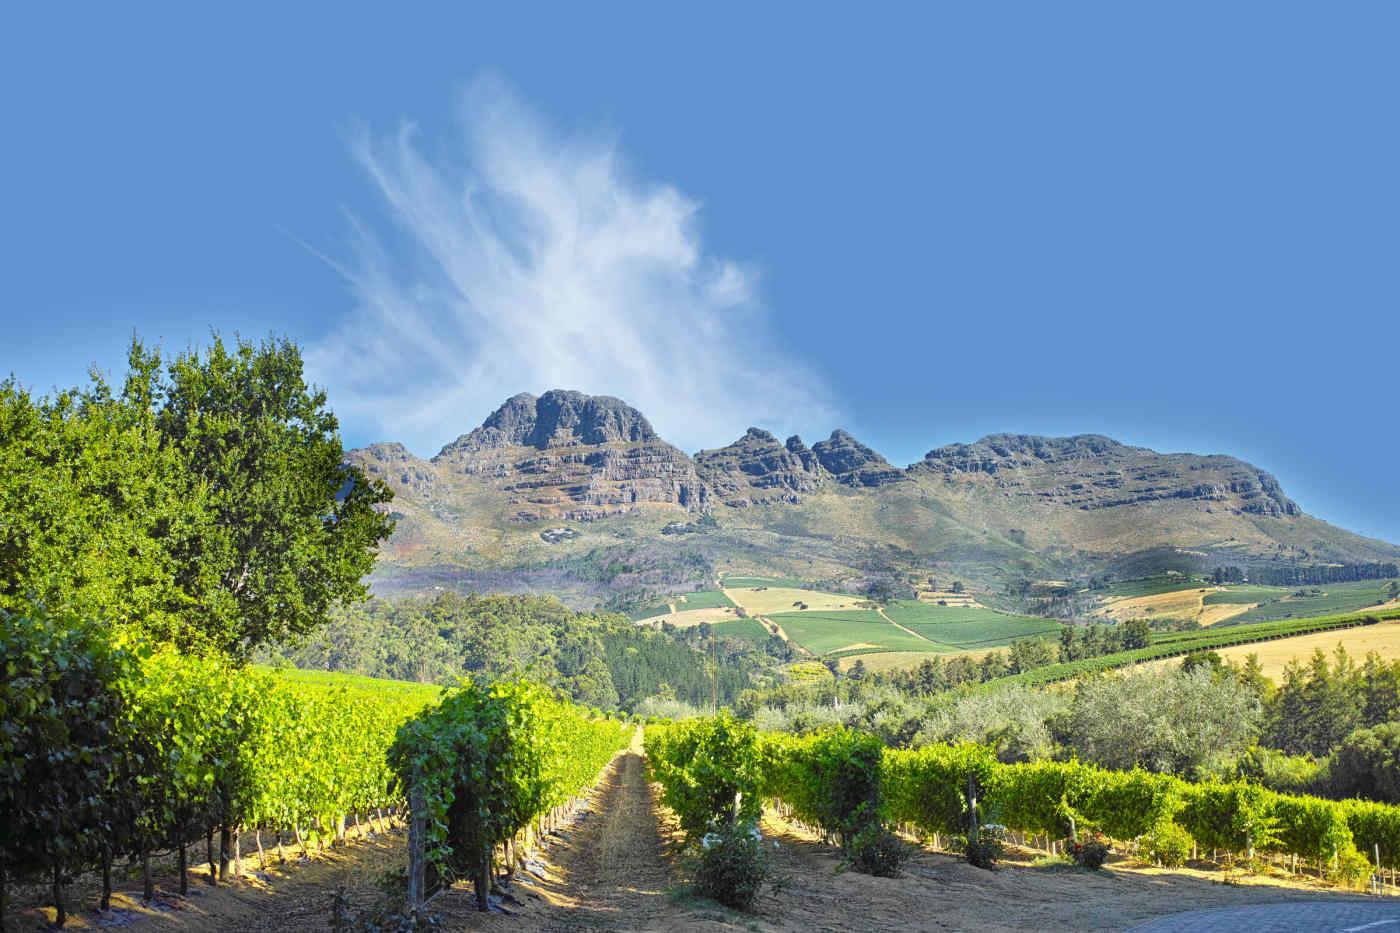 Stellenbosch in the Western Cape